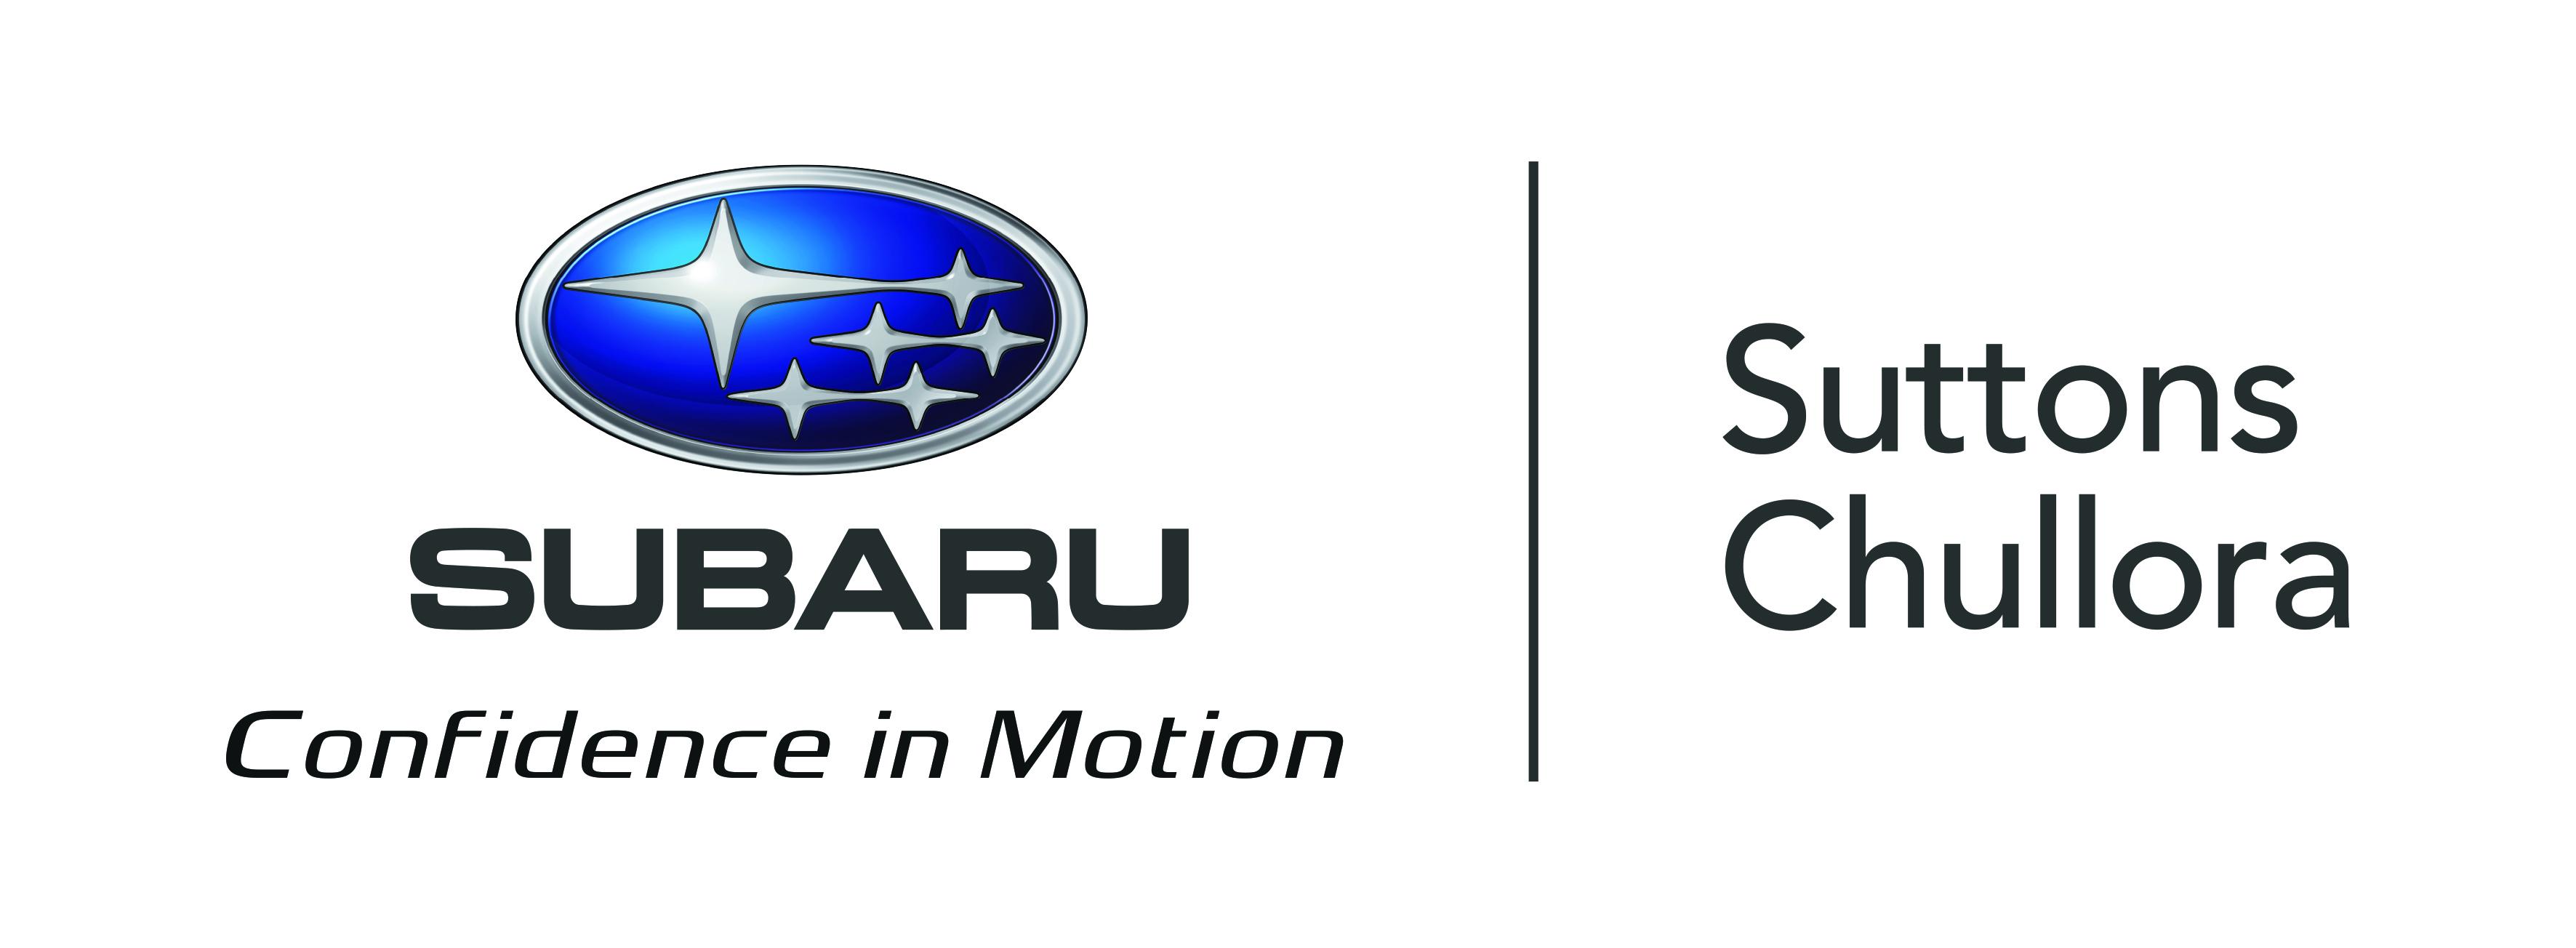 Suttons Chullora Subaru